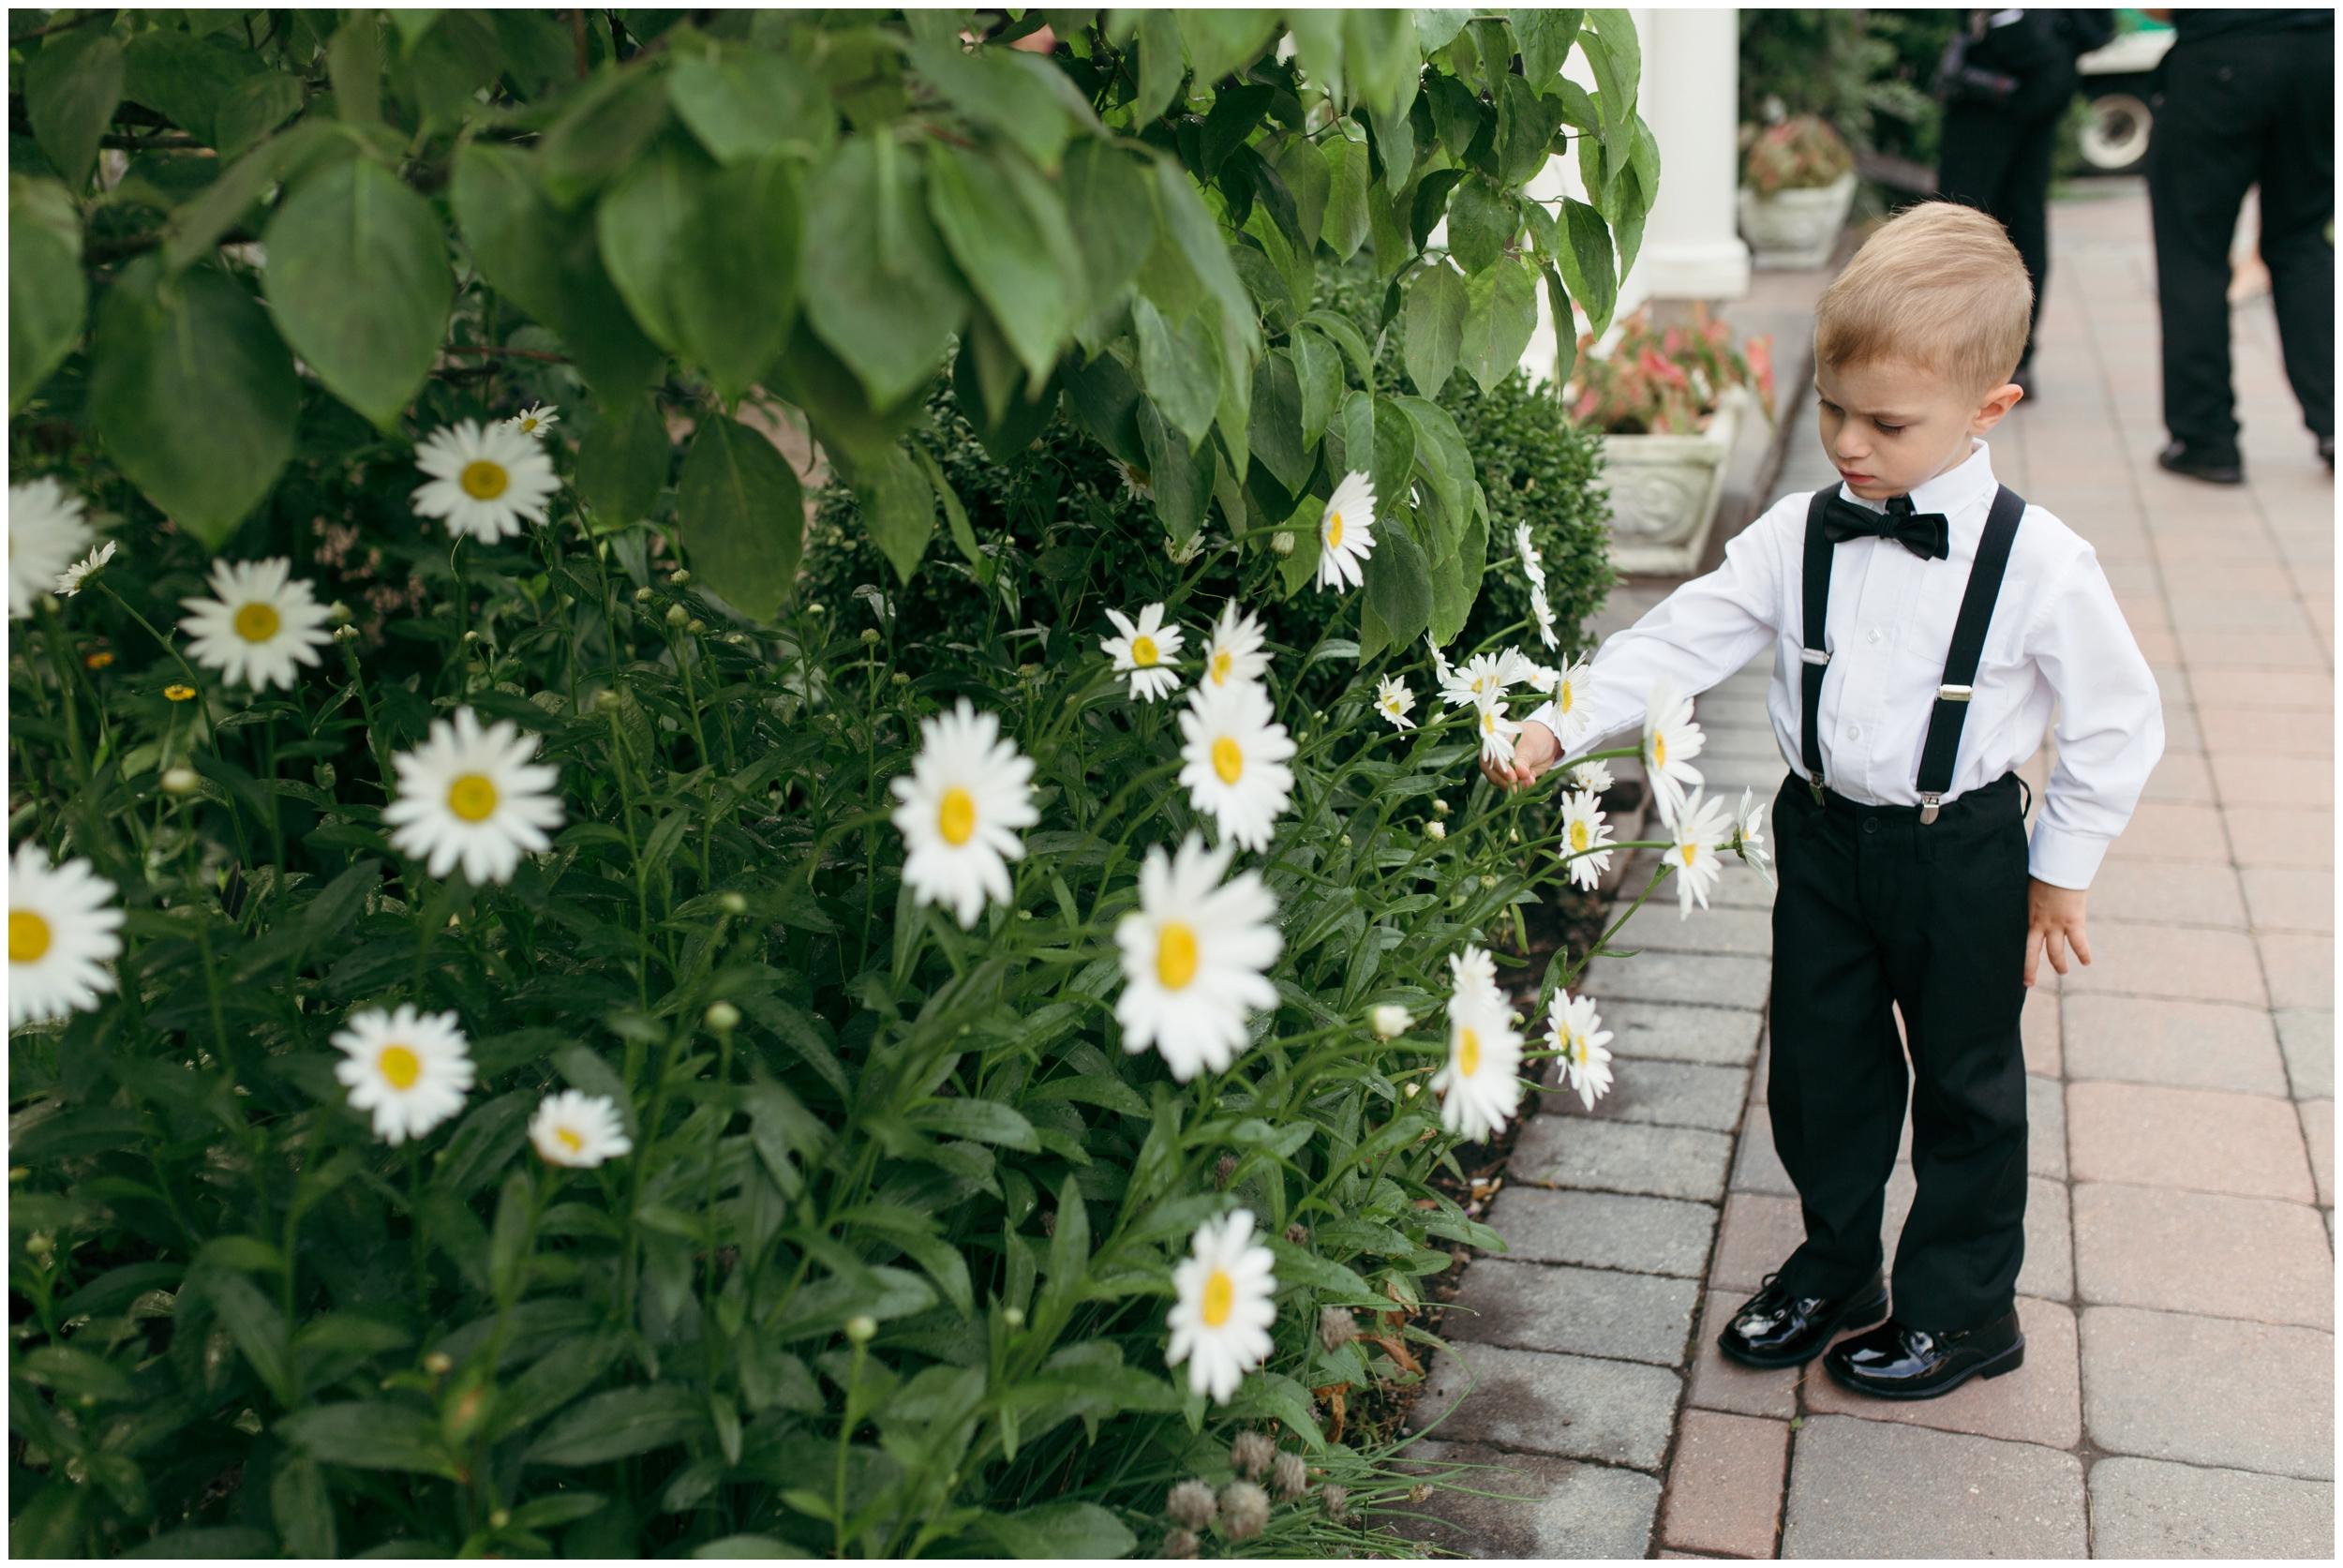 Willowdale-Estate-Wedding-Bailey-Q-Photo-Boston-Wedding-Photographer-026.JPG